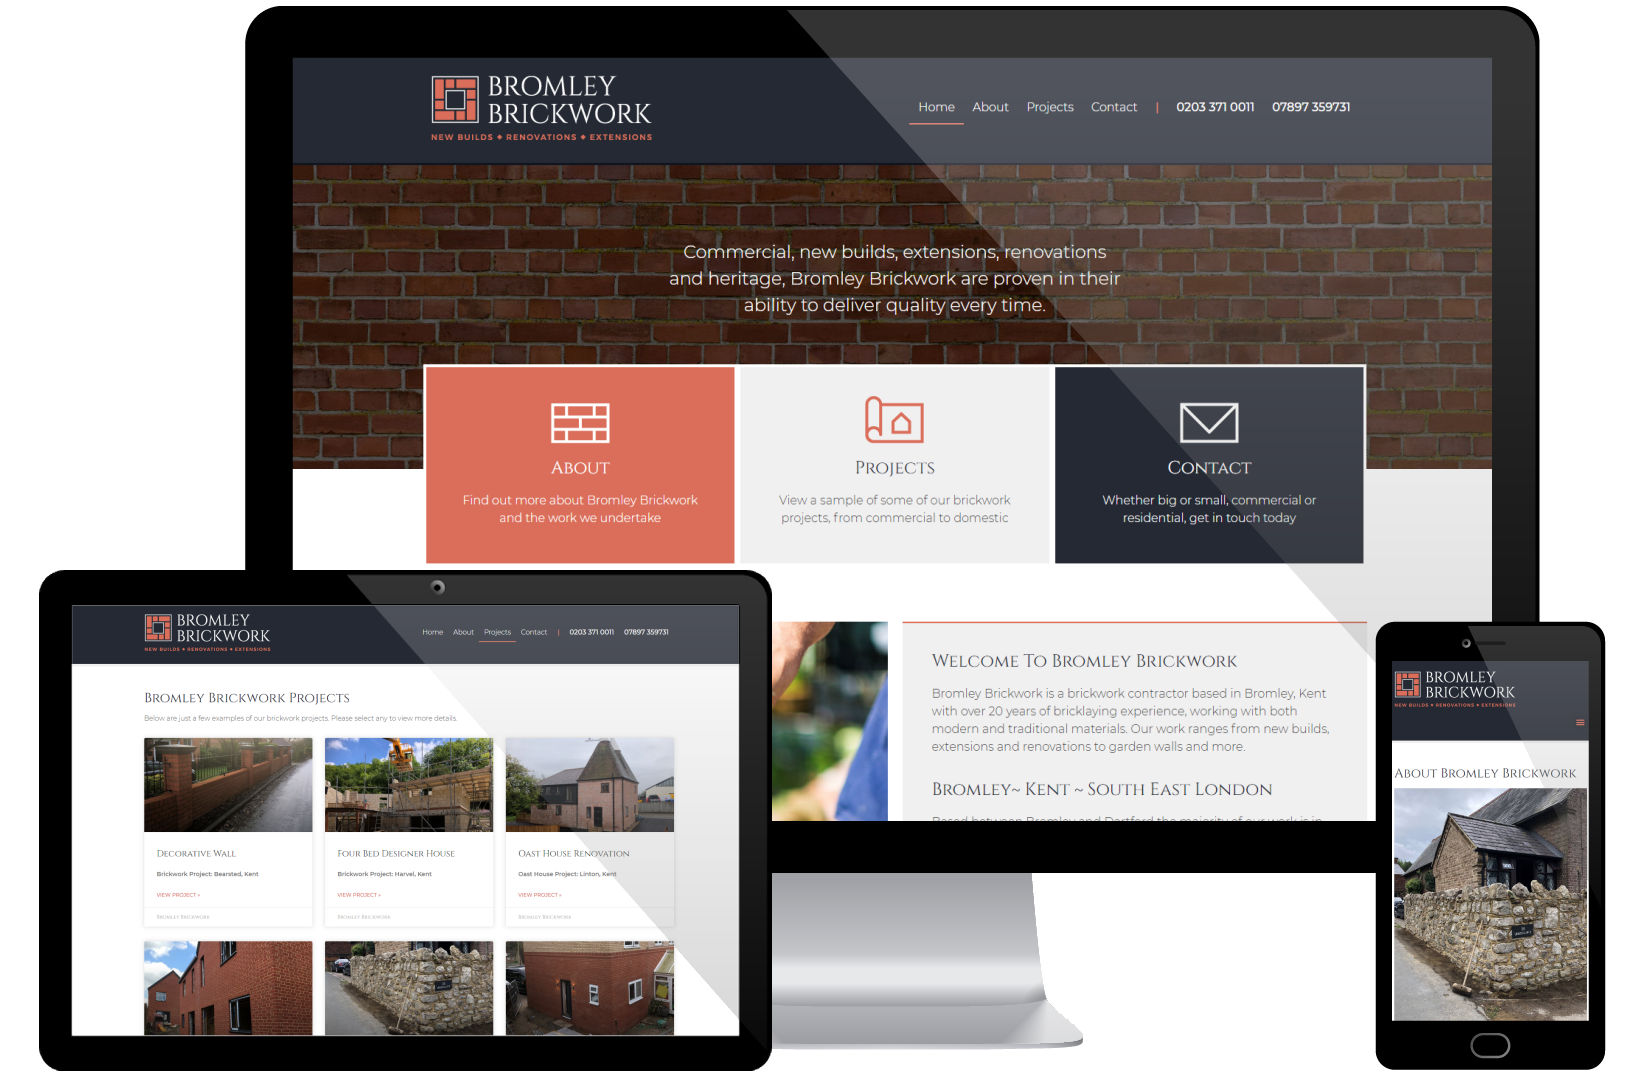 Web Design Portfolio - Bromley Brickwork - Screenshots